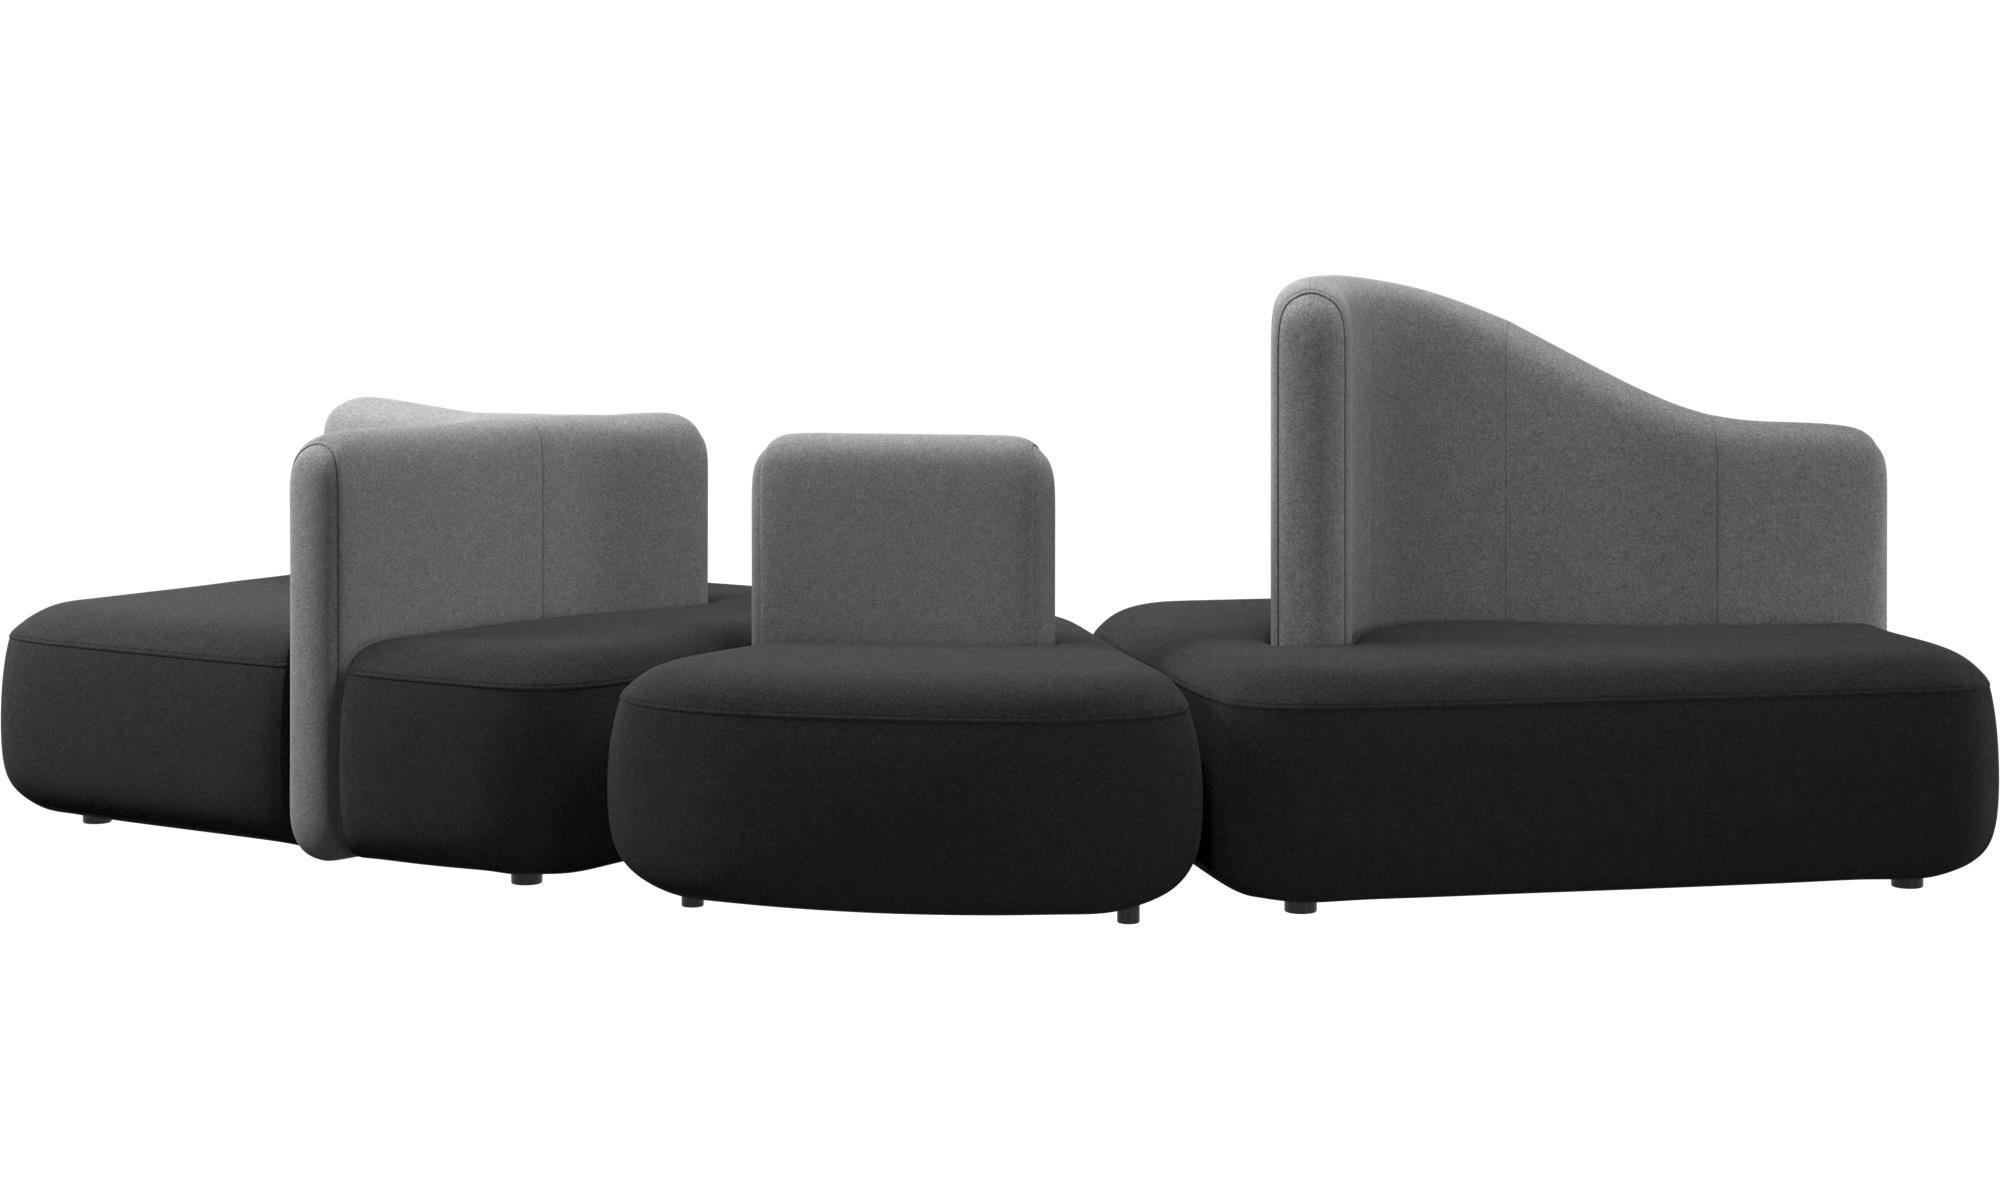 Modular sofas Ottawa sofa BoConcept